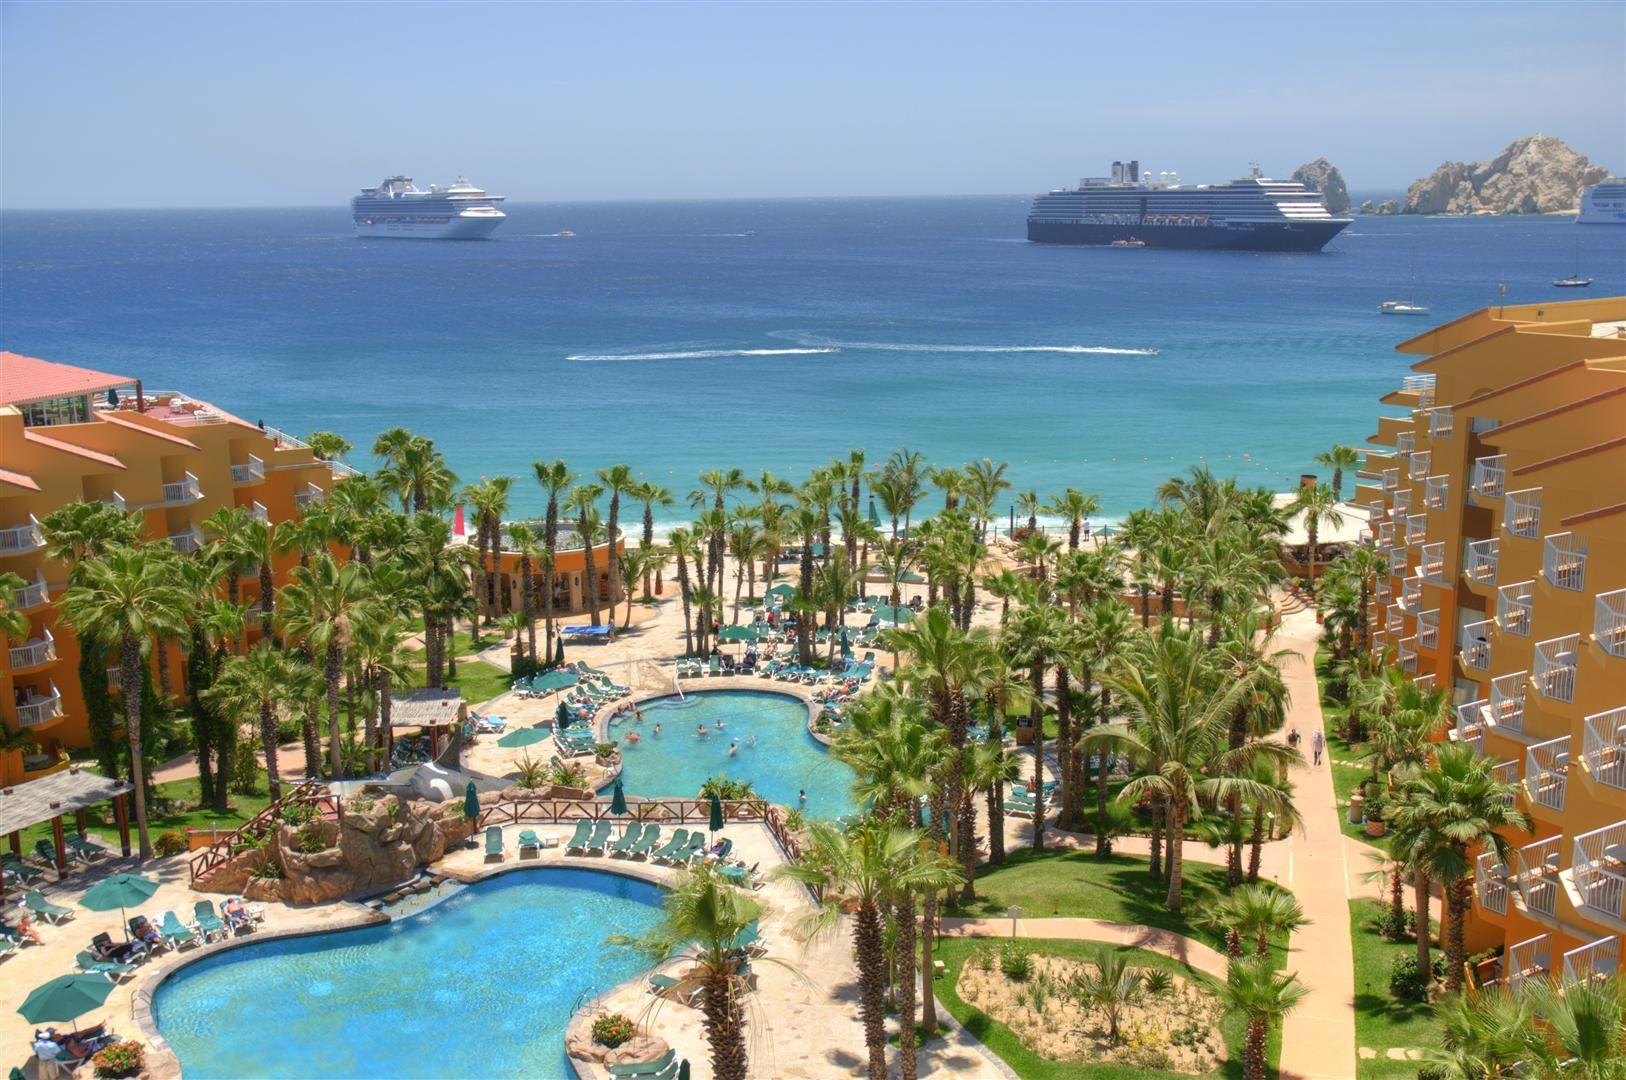 Villa del palmar flamingos beach resort spa 5 star beach resort with world